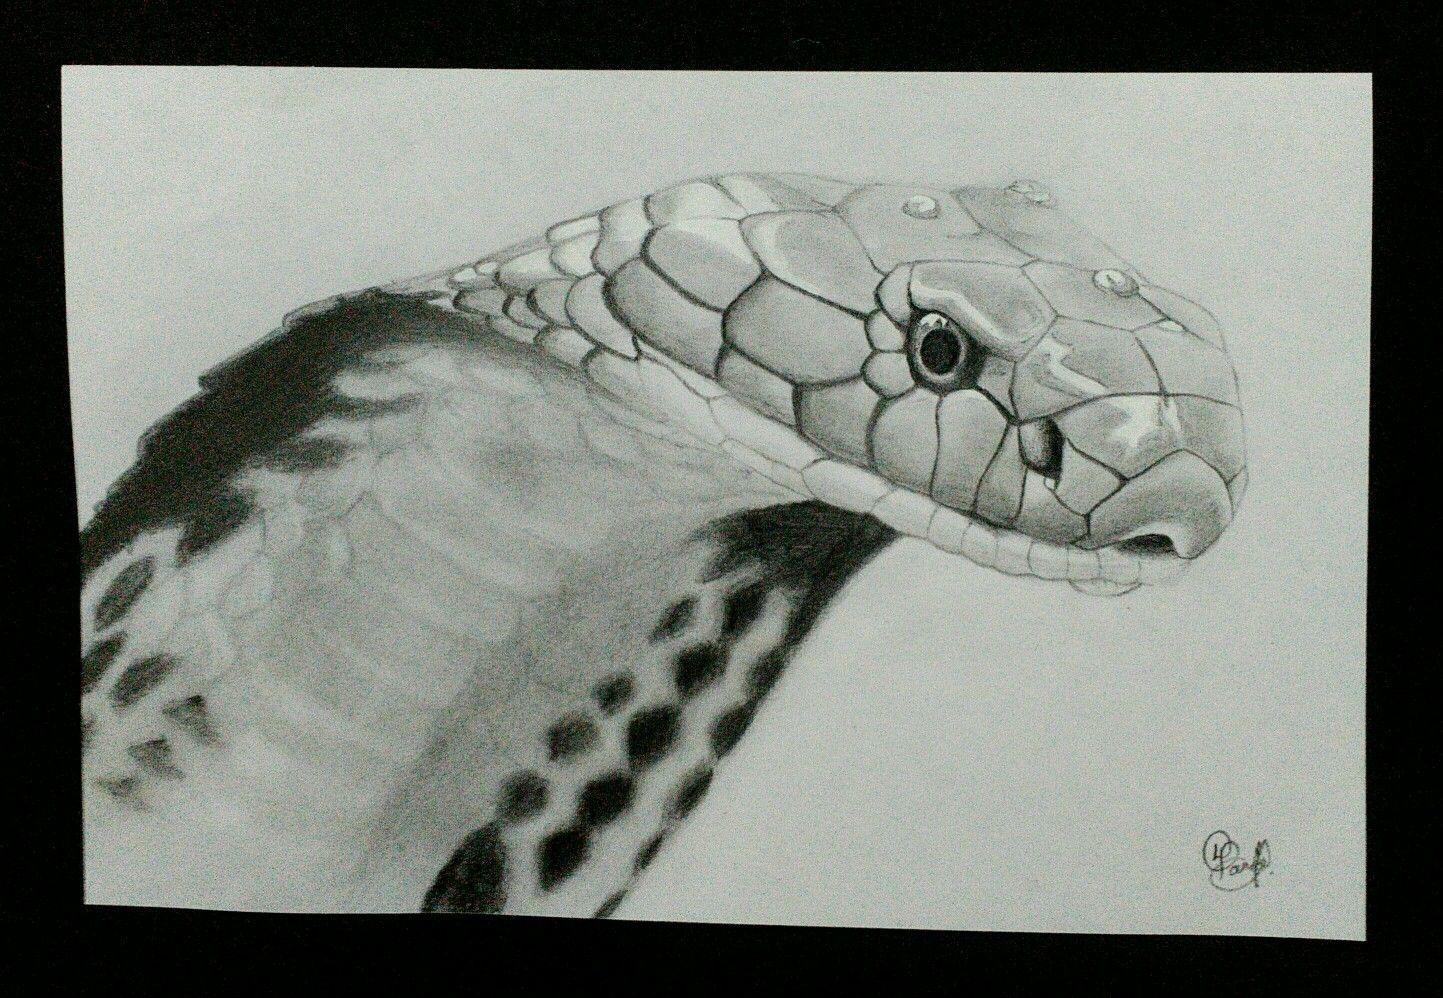 Pencil sketch the king cobra